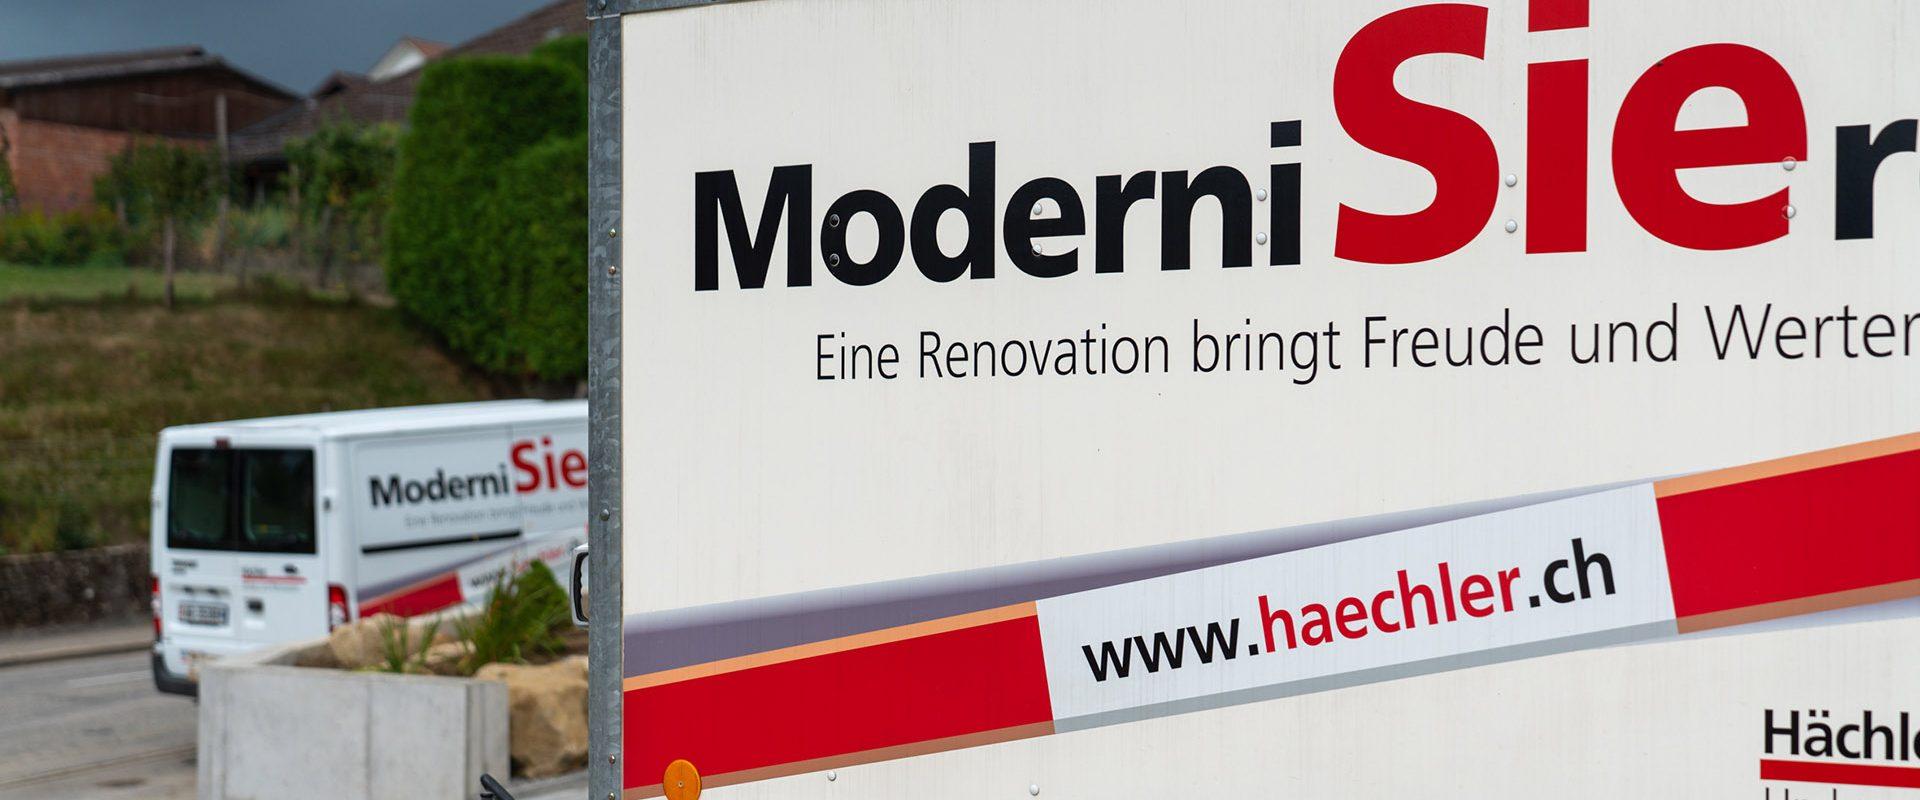 umbau-renovation-modernisieren-anhaenger